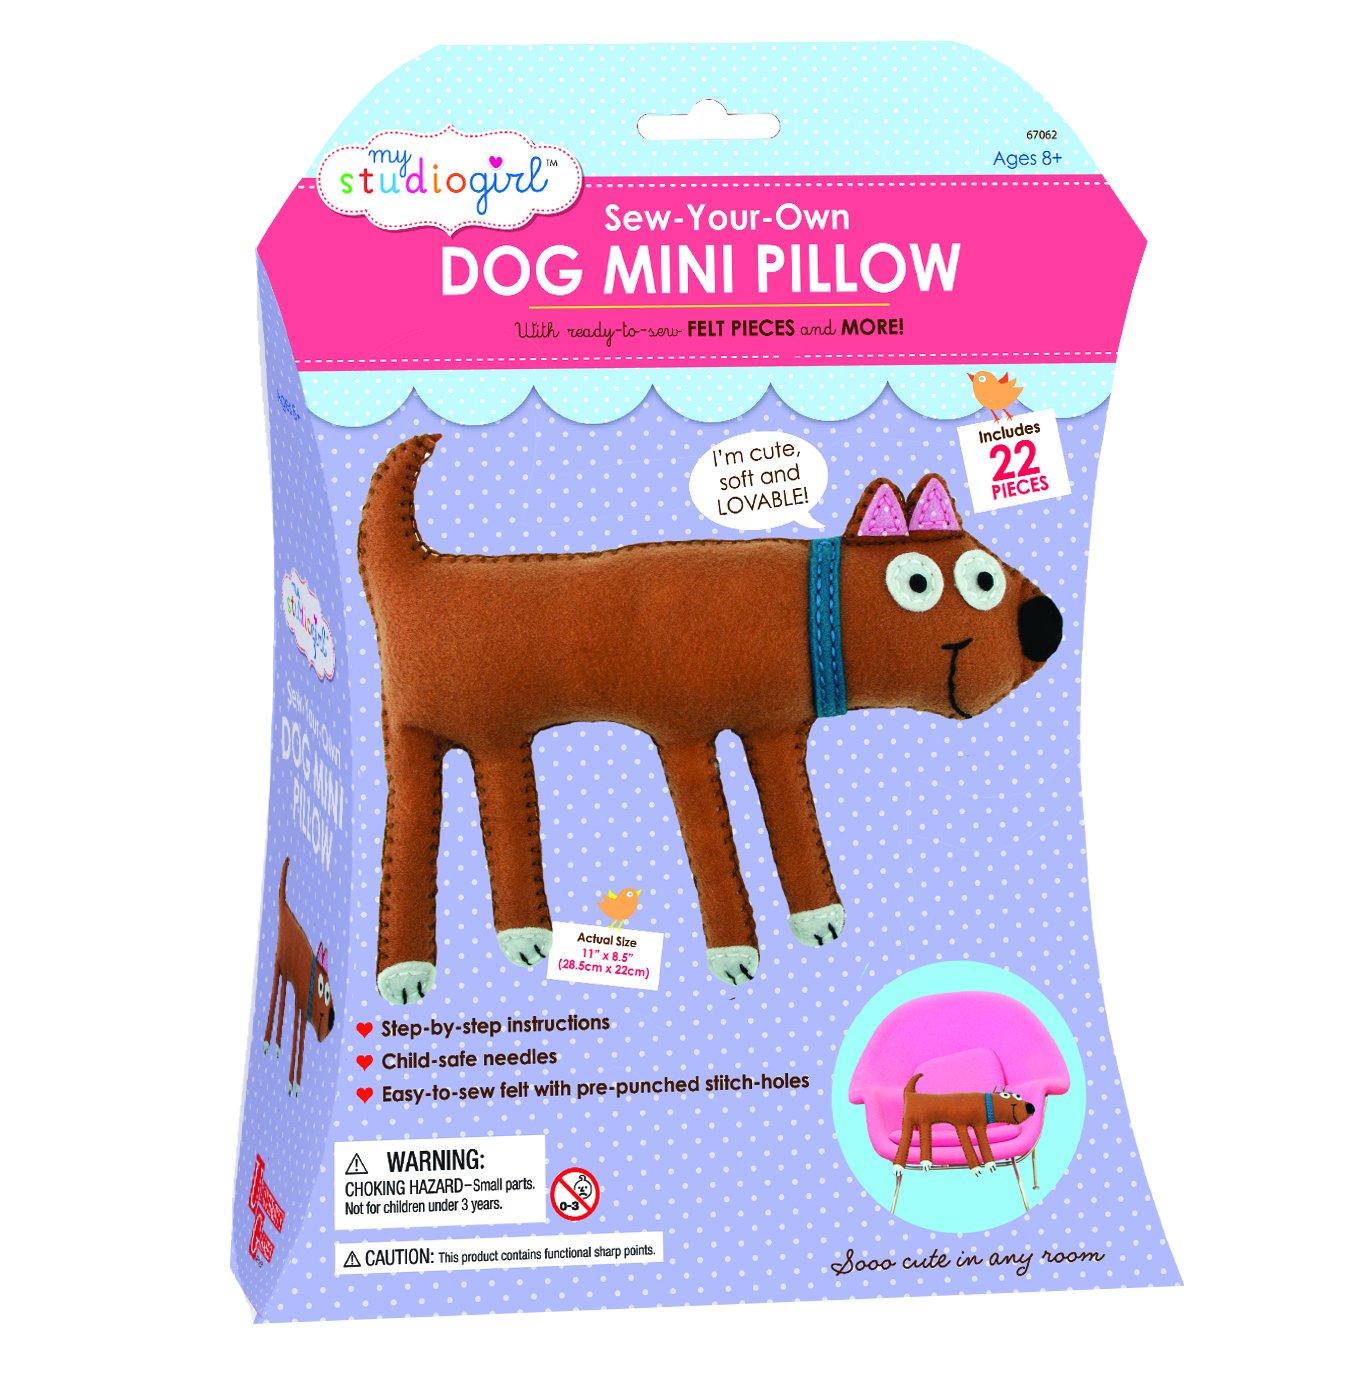 Dog University Games 67062 My Studio Girl Mini Pillows